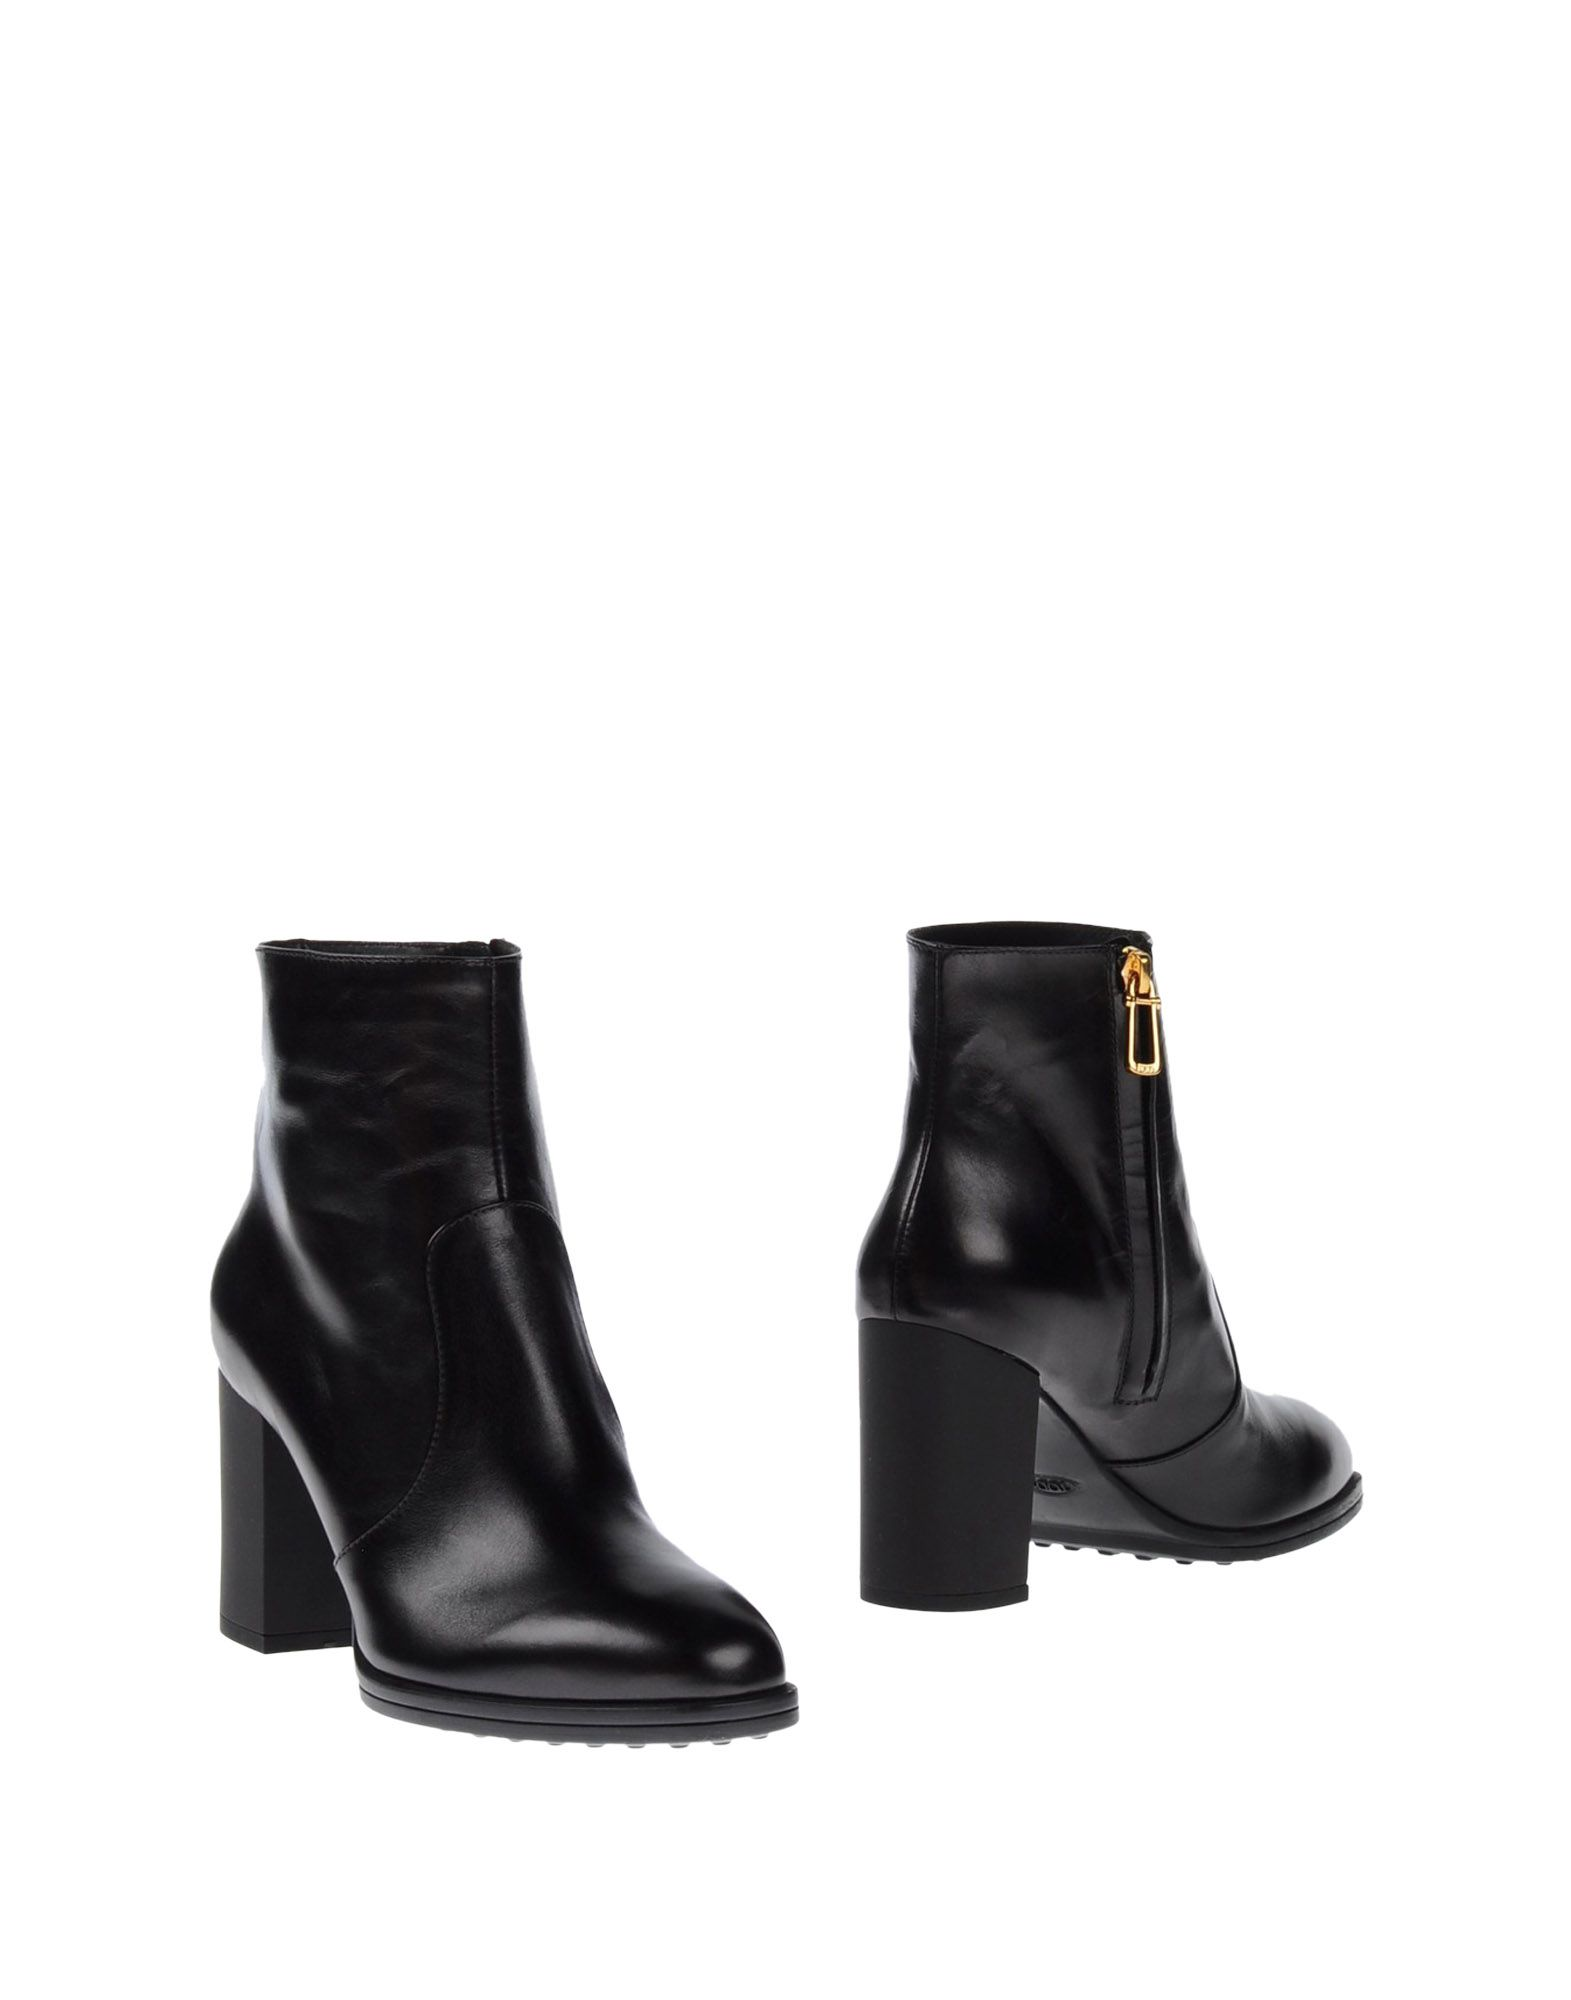 Tod's Stiefelette Damen gut  11033941CBGünstige gut Damen aussehende Schuhe e15247